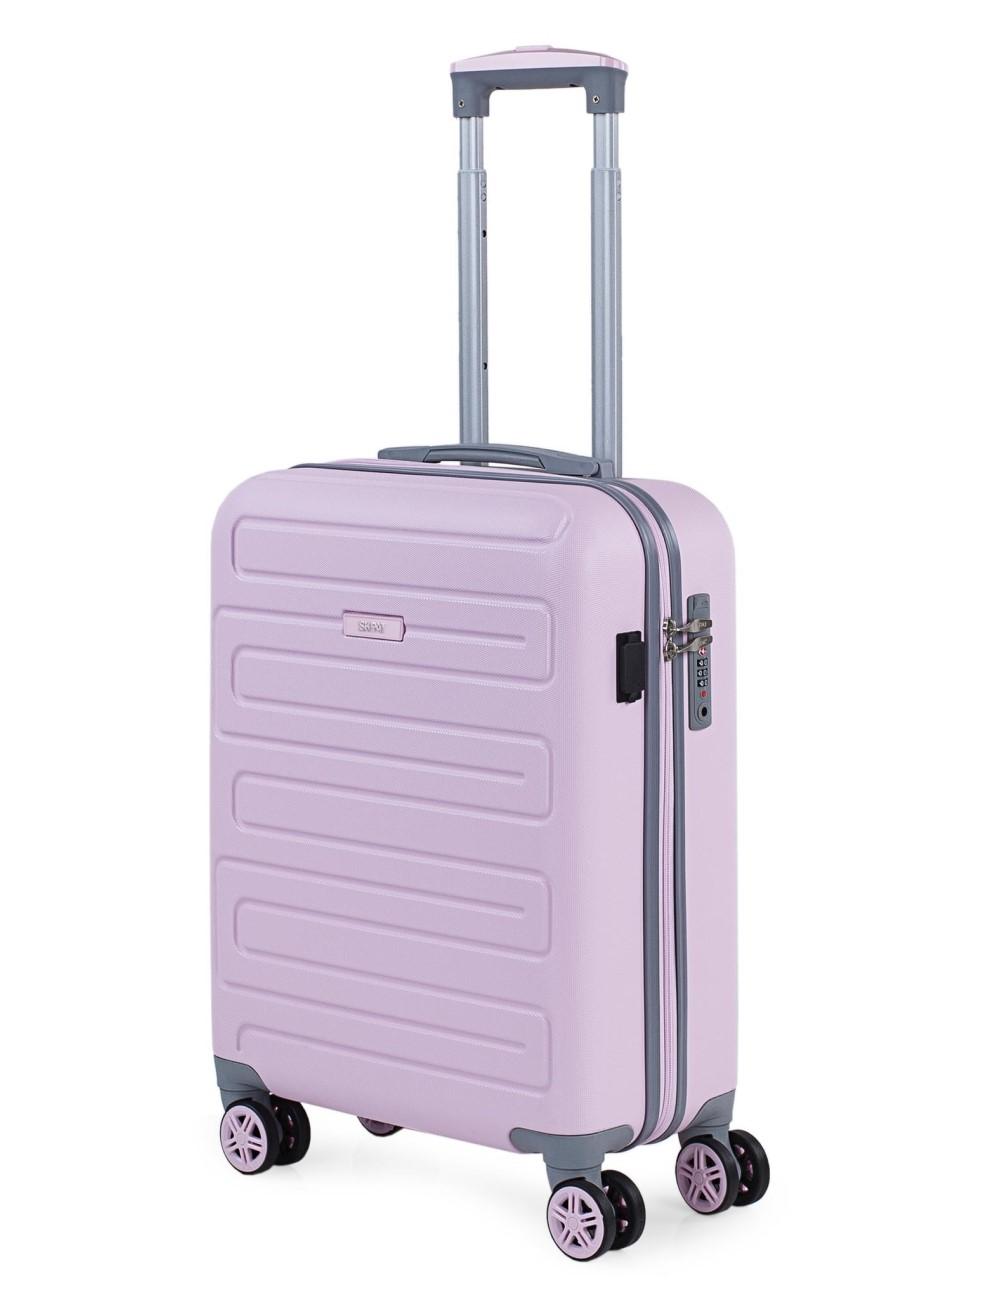 17505003 Maleta Cabina con salida puerto usb Skpat Mónaco rosa